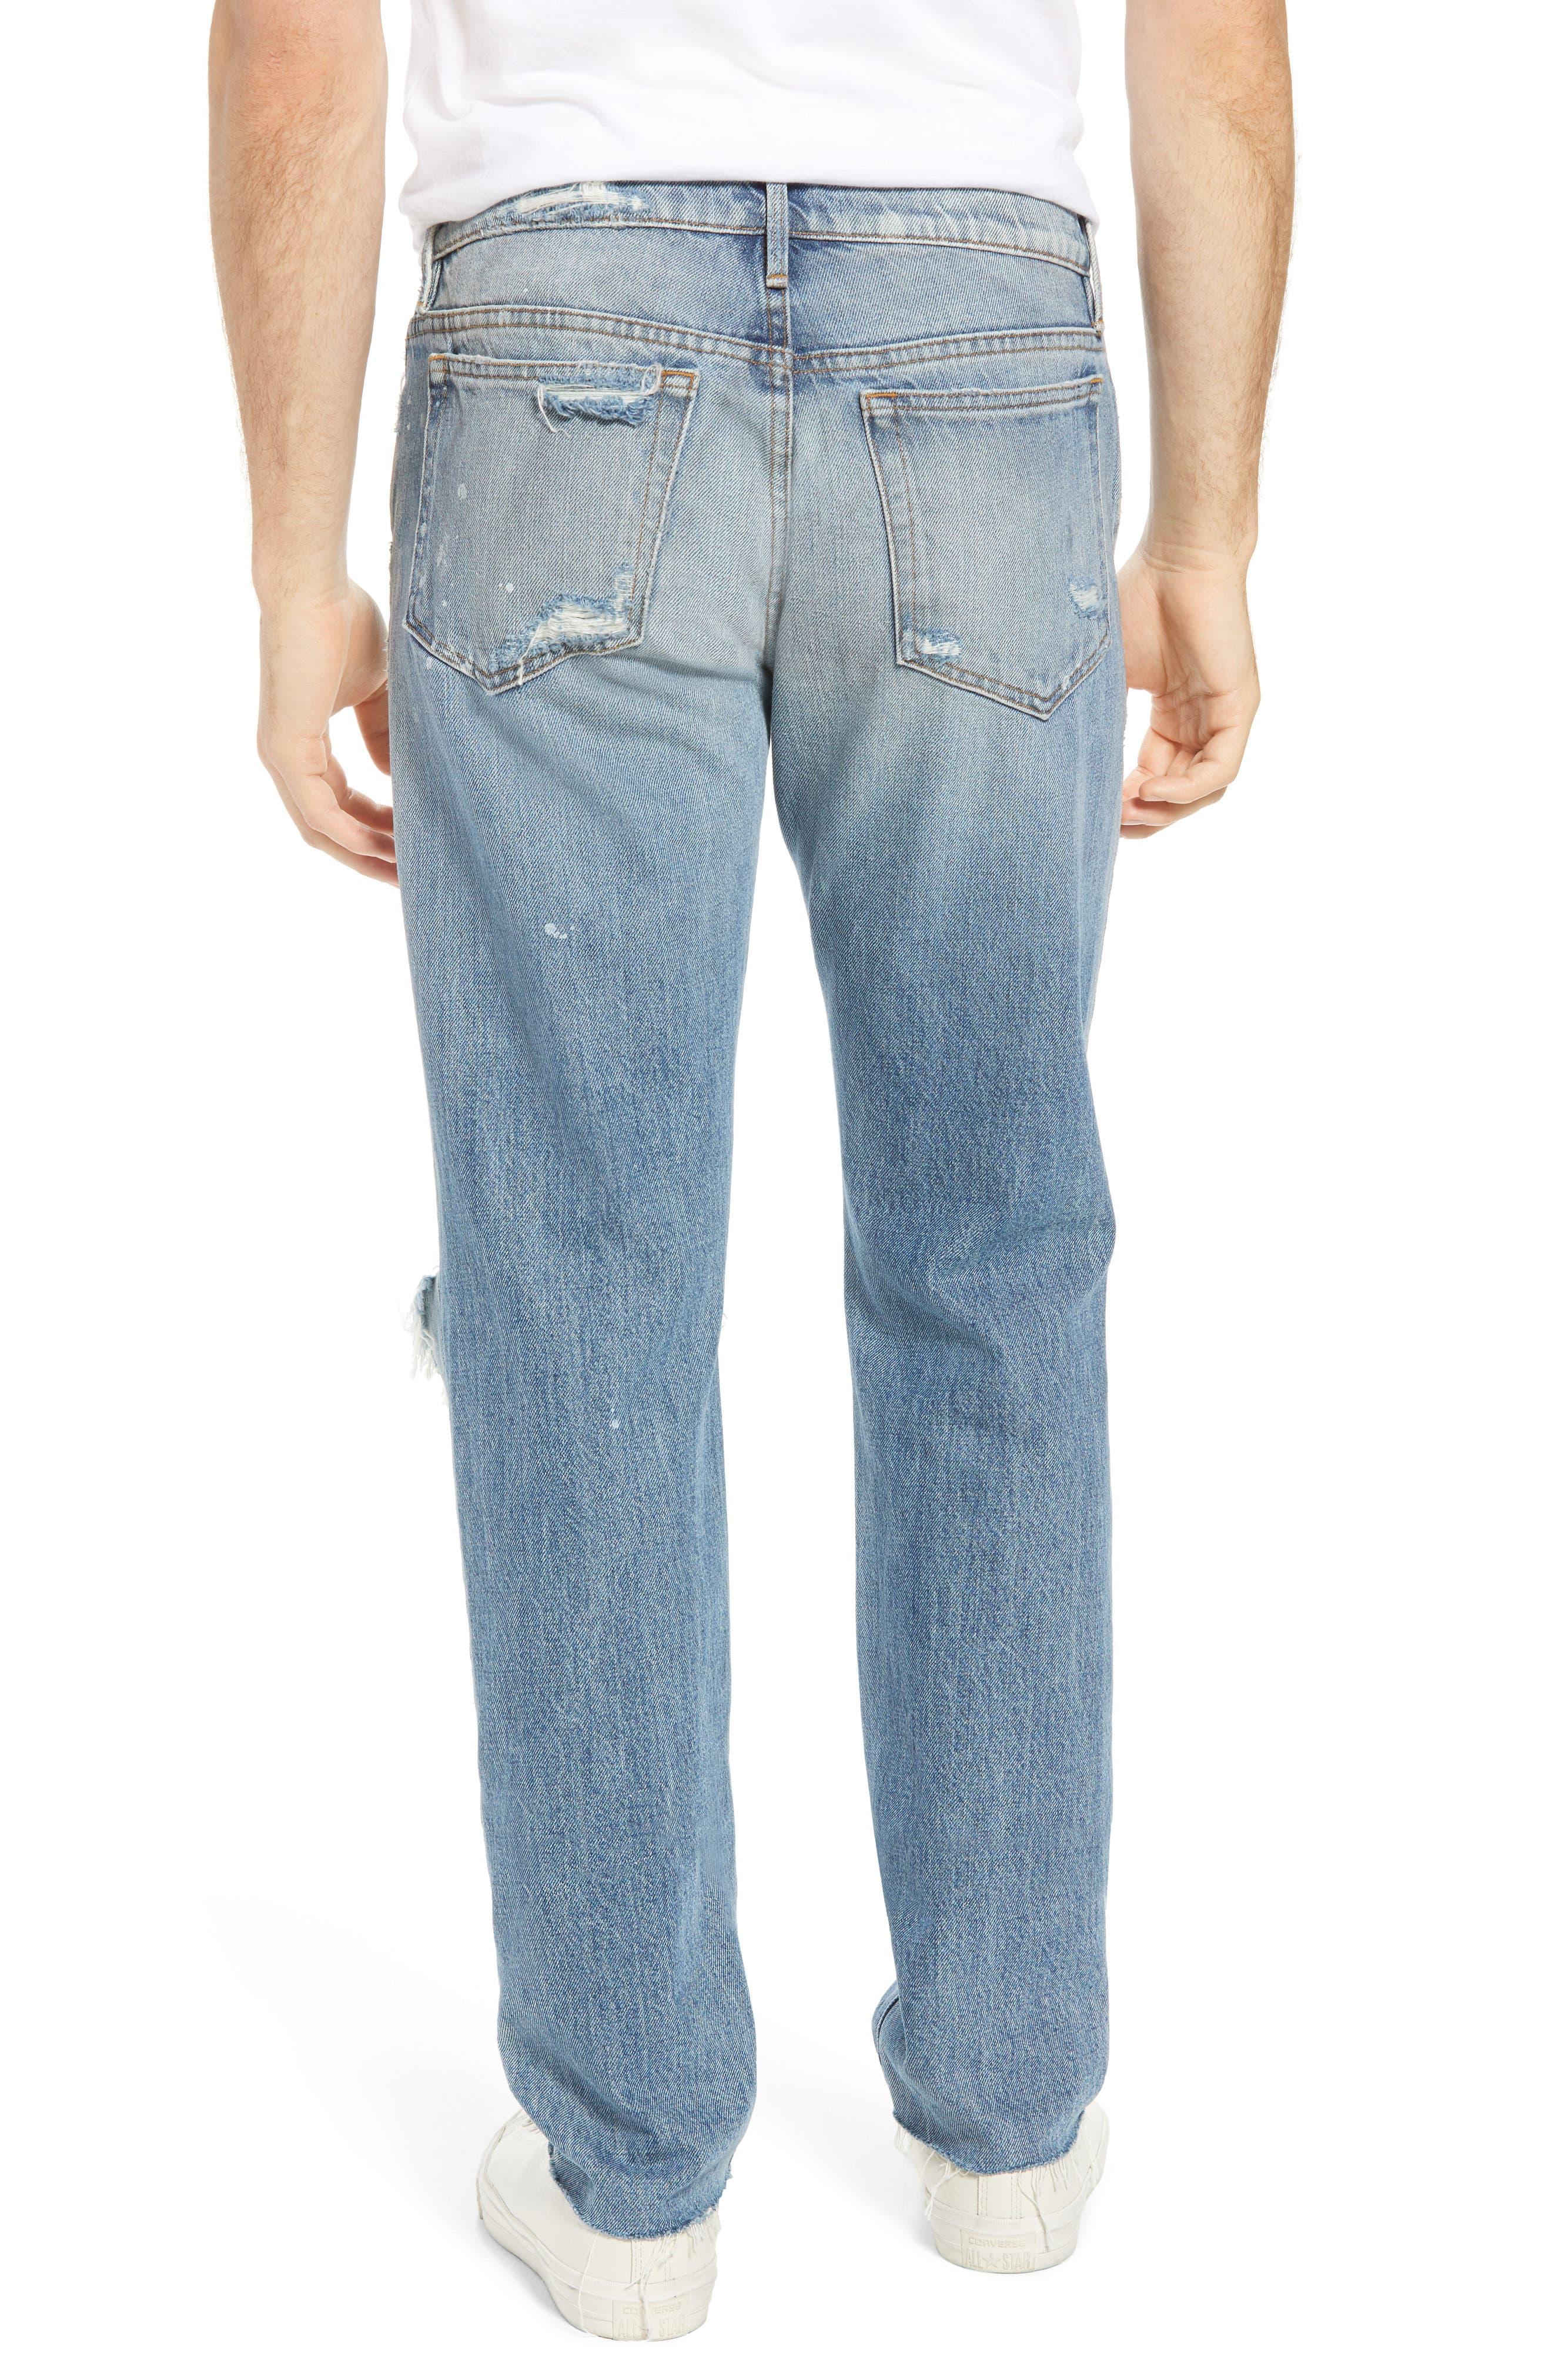 L'Homme Slim Fit Jeans,                             Alternate thumbnail 2, color,                             Bizworth